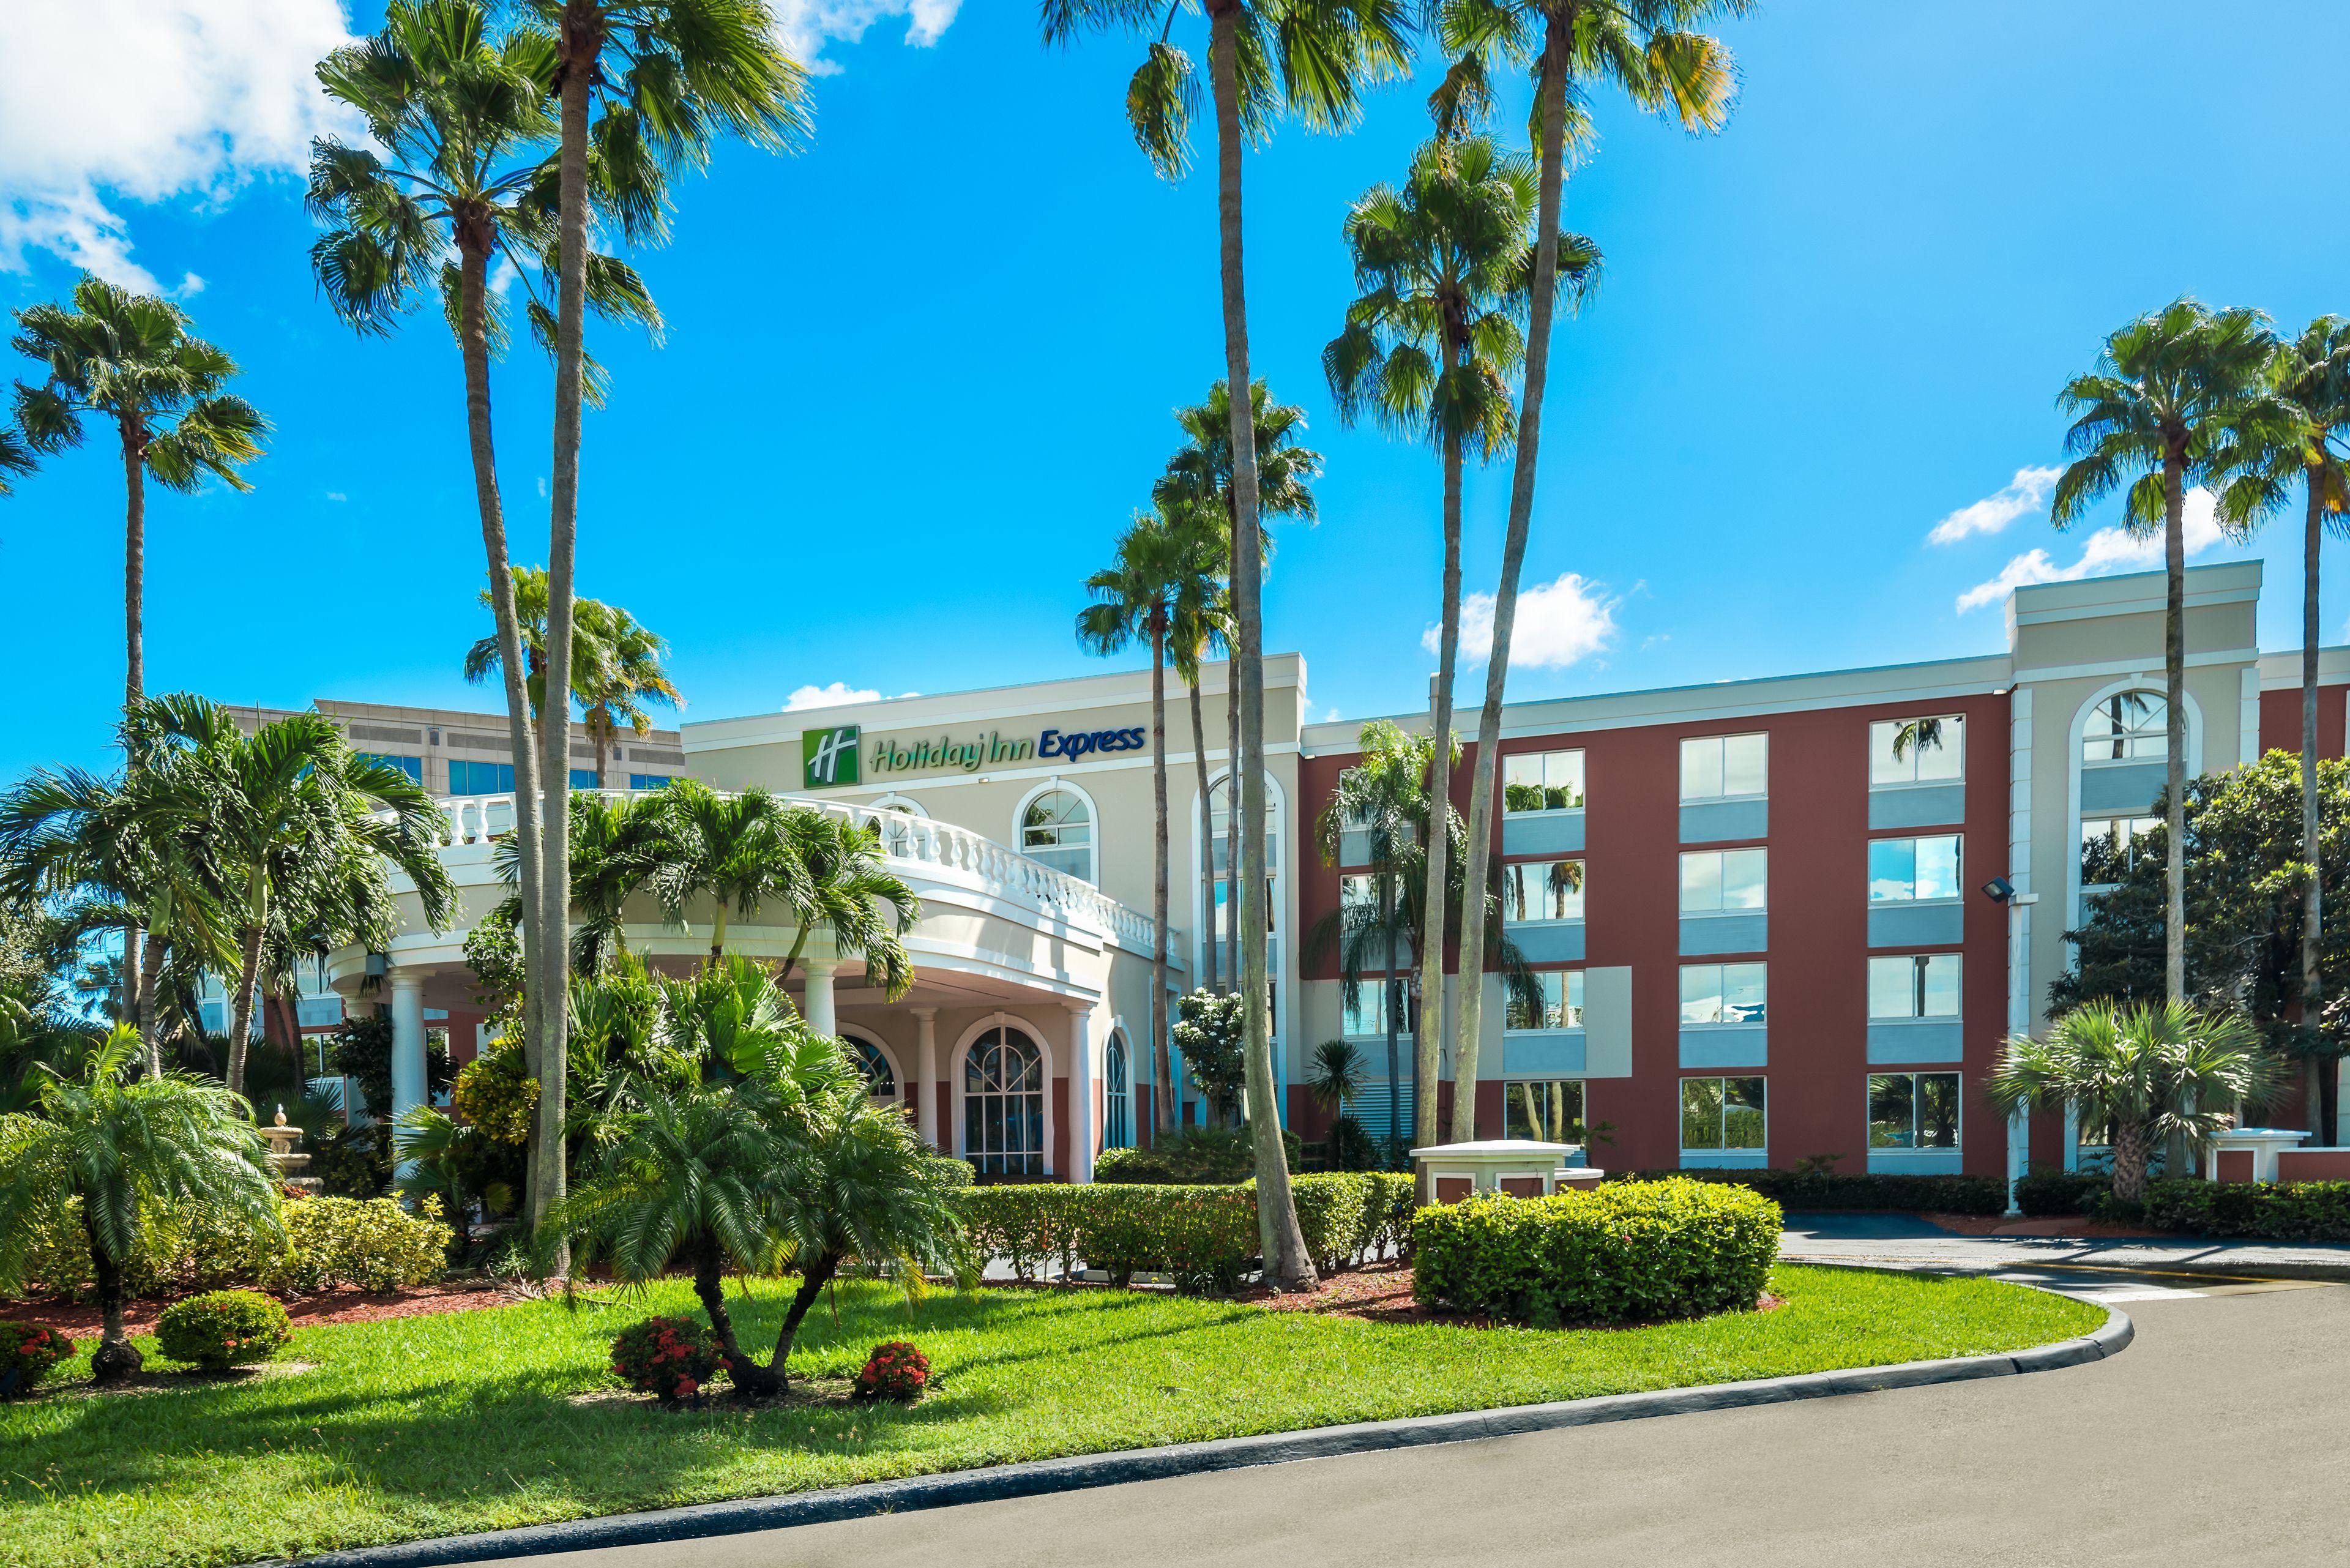 Holiday Inn Express Doral